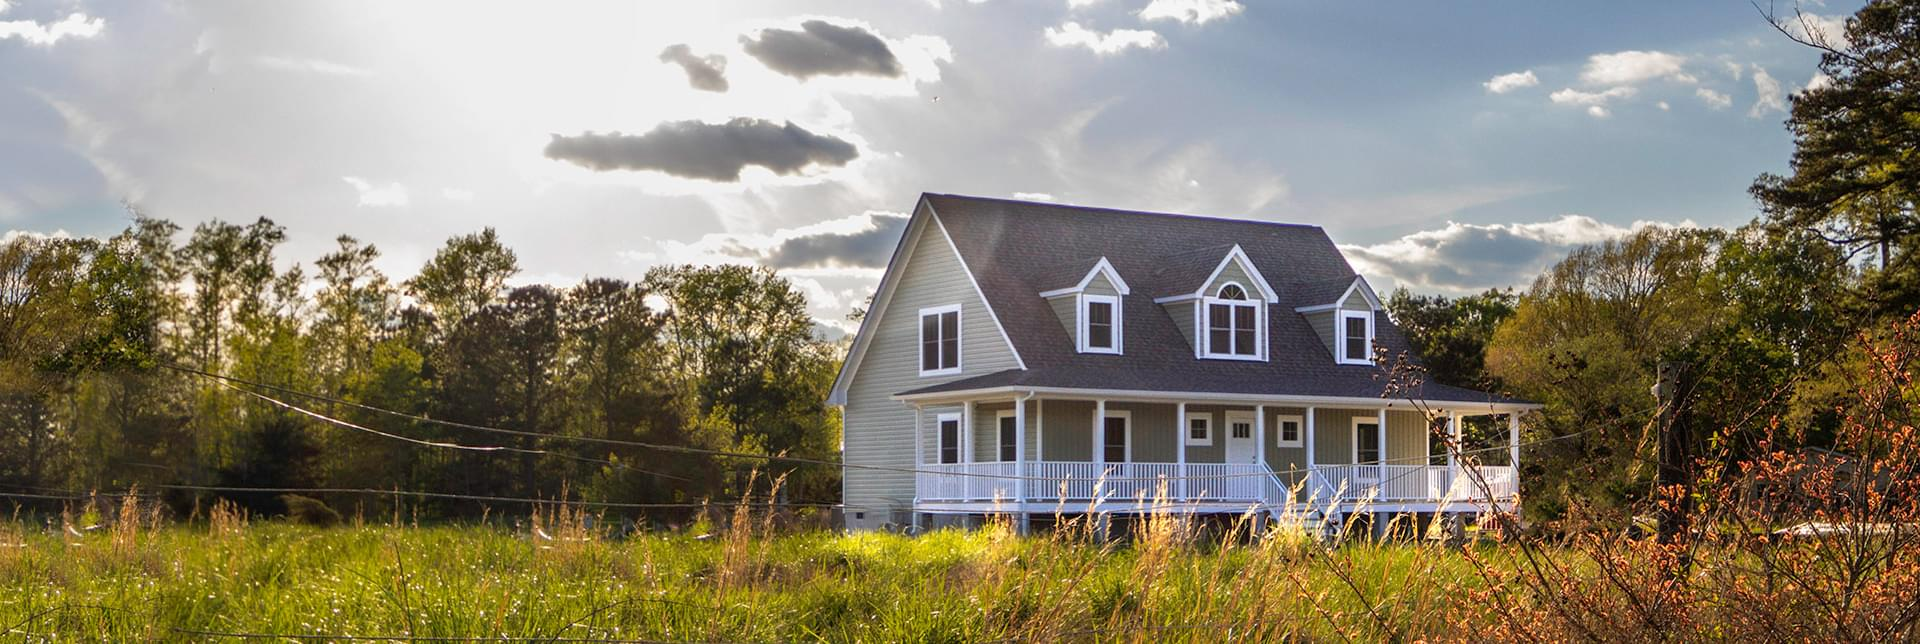 New Homes in Lynchburg VA